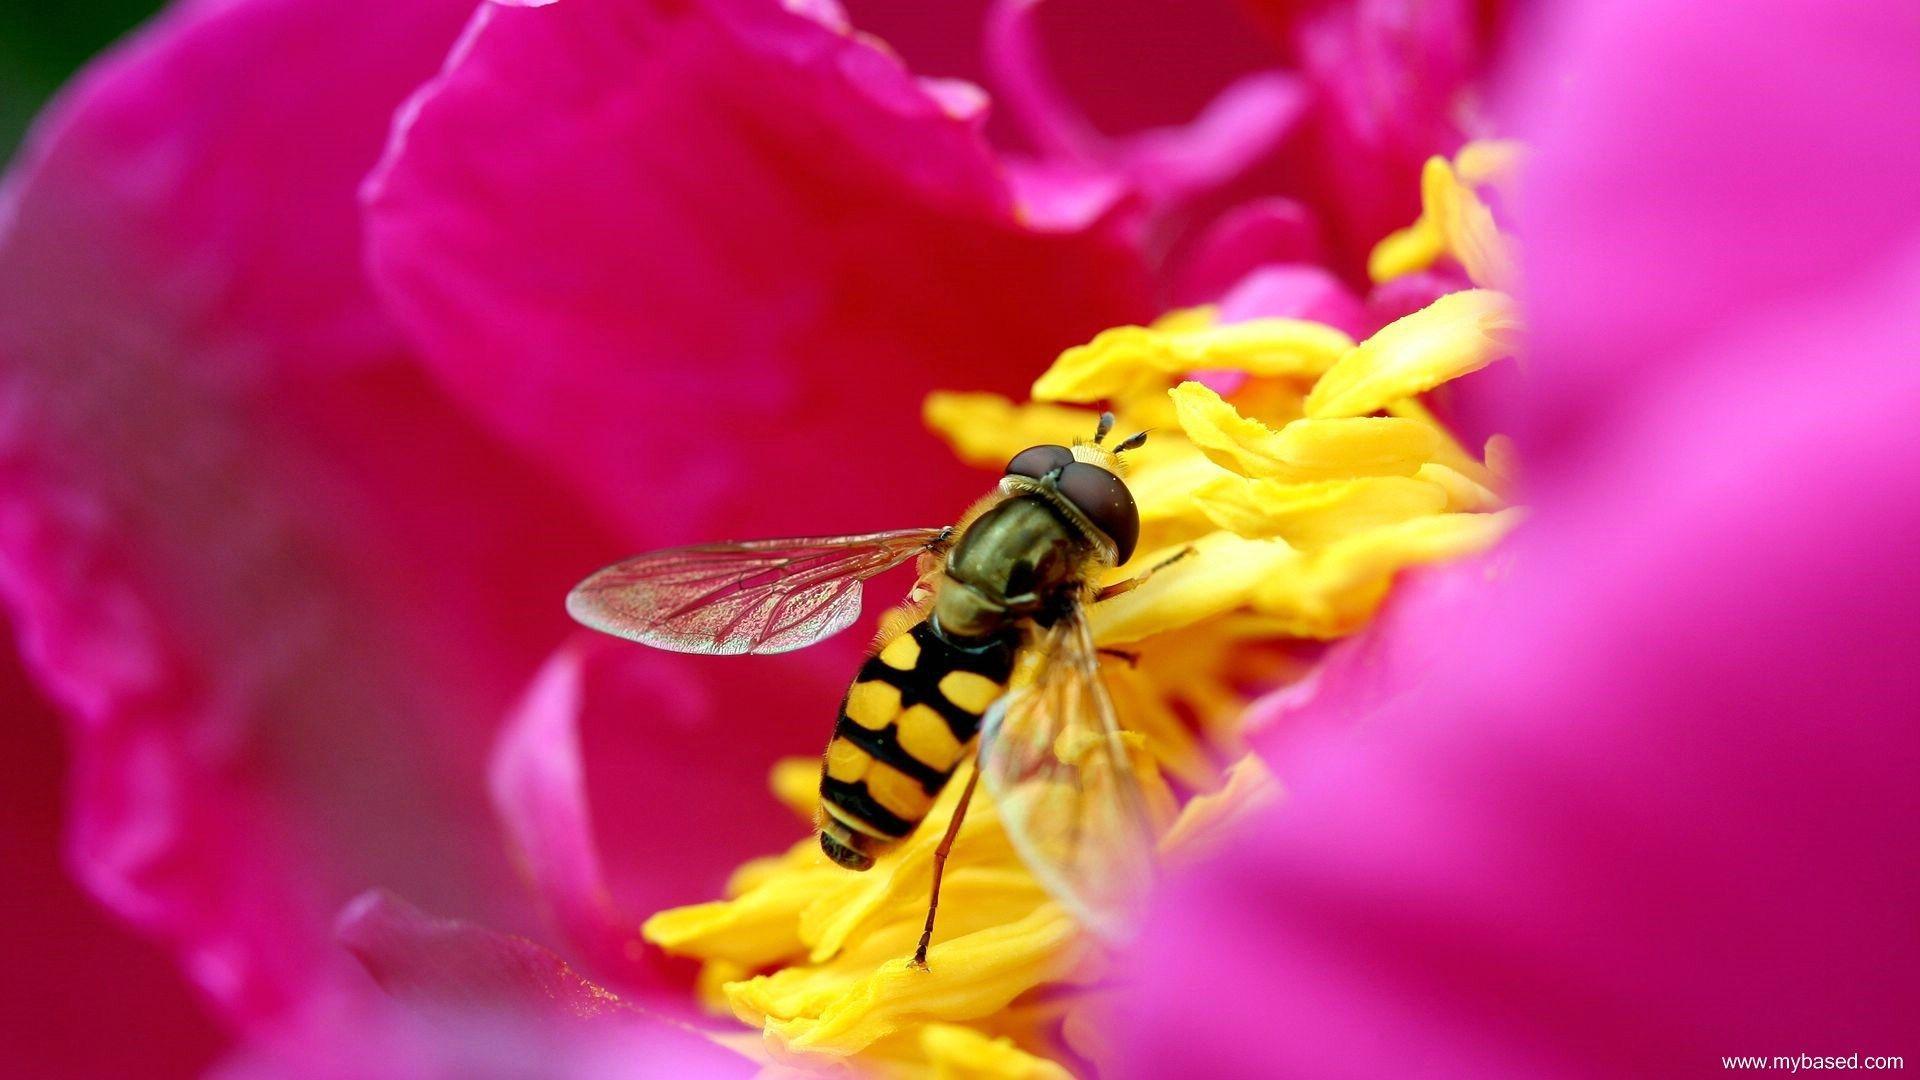 bee wallpaper pack 1080p hd (Lavar Grant 1920x1080) Bee